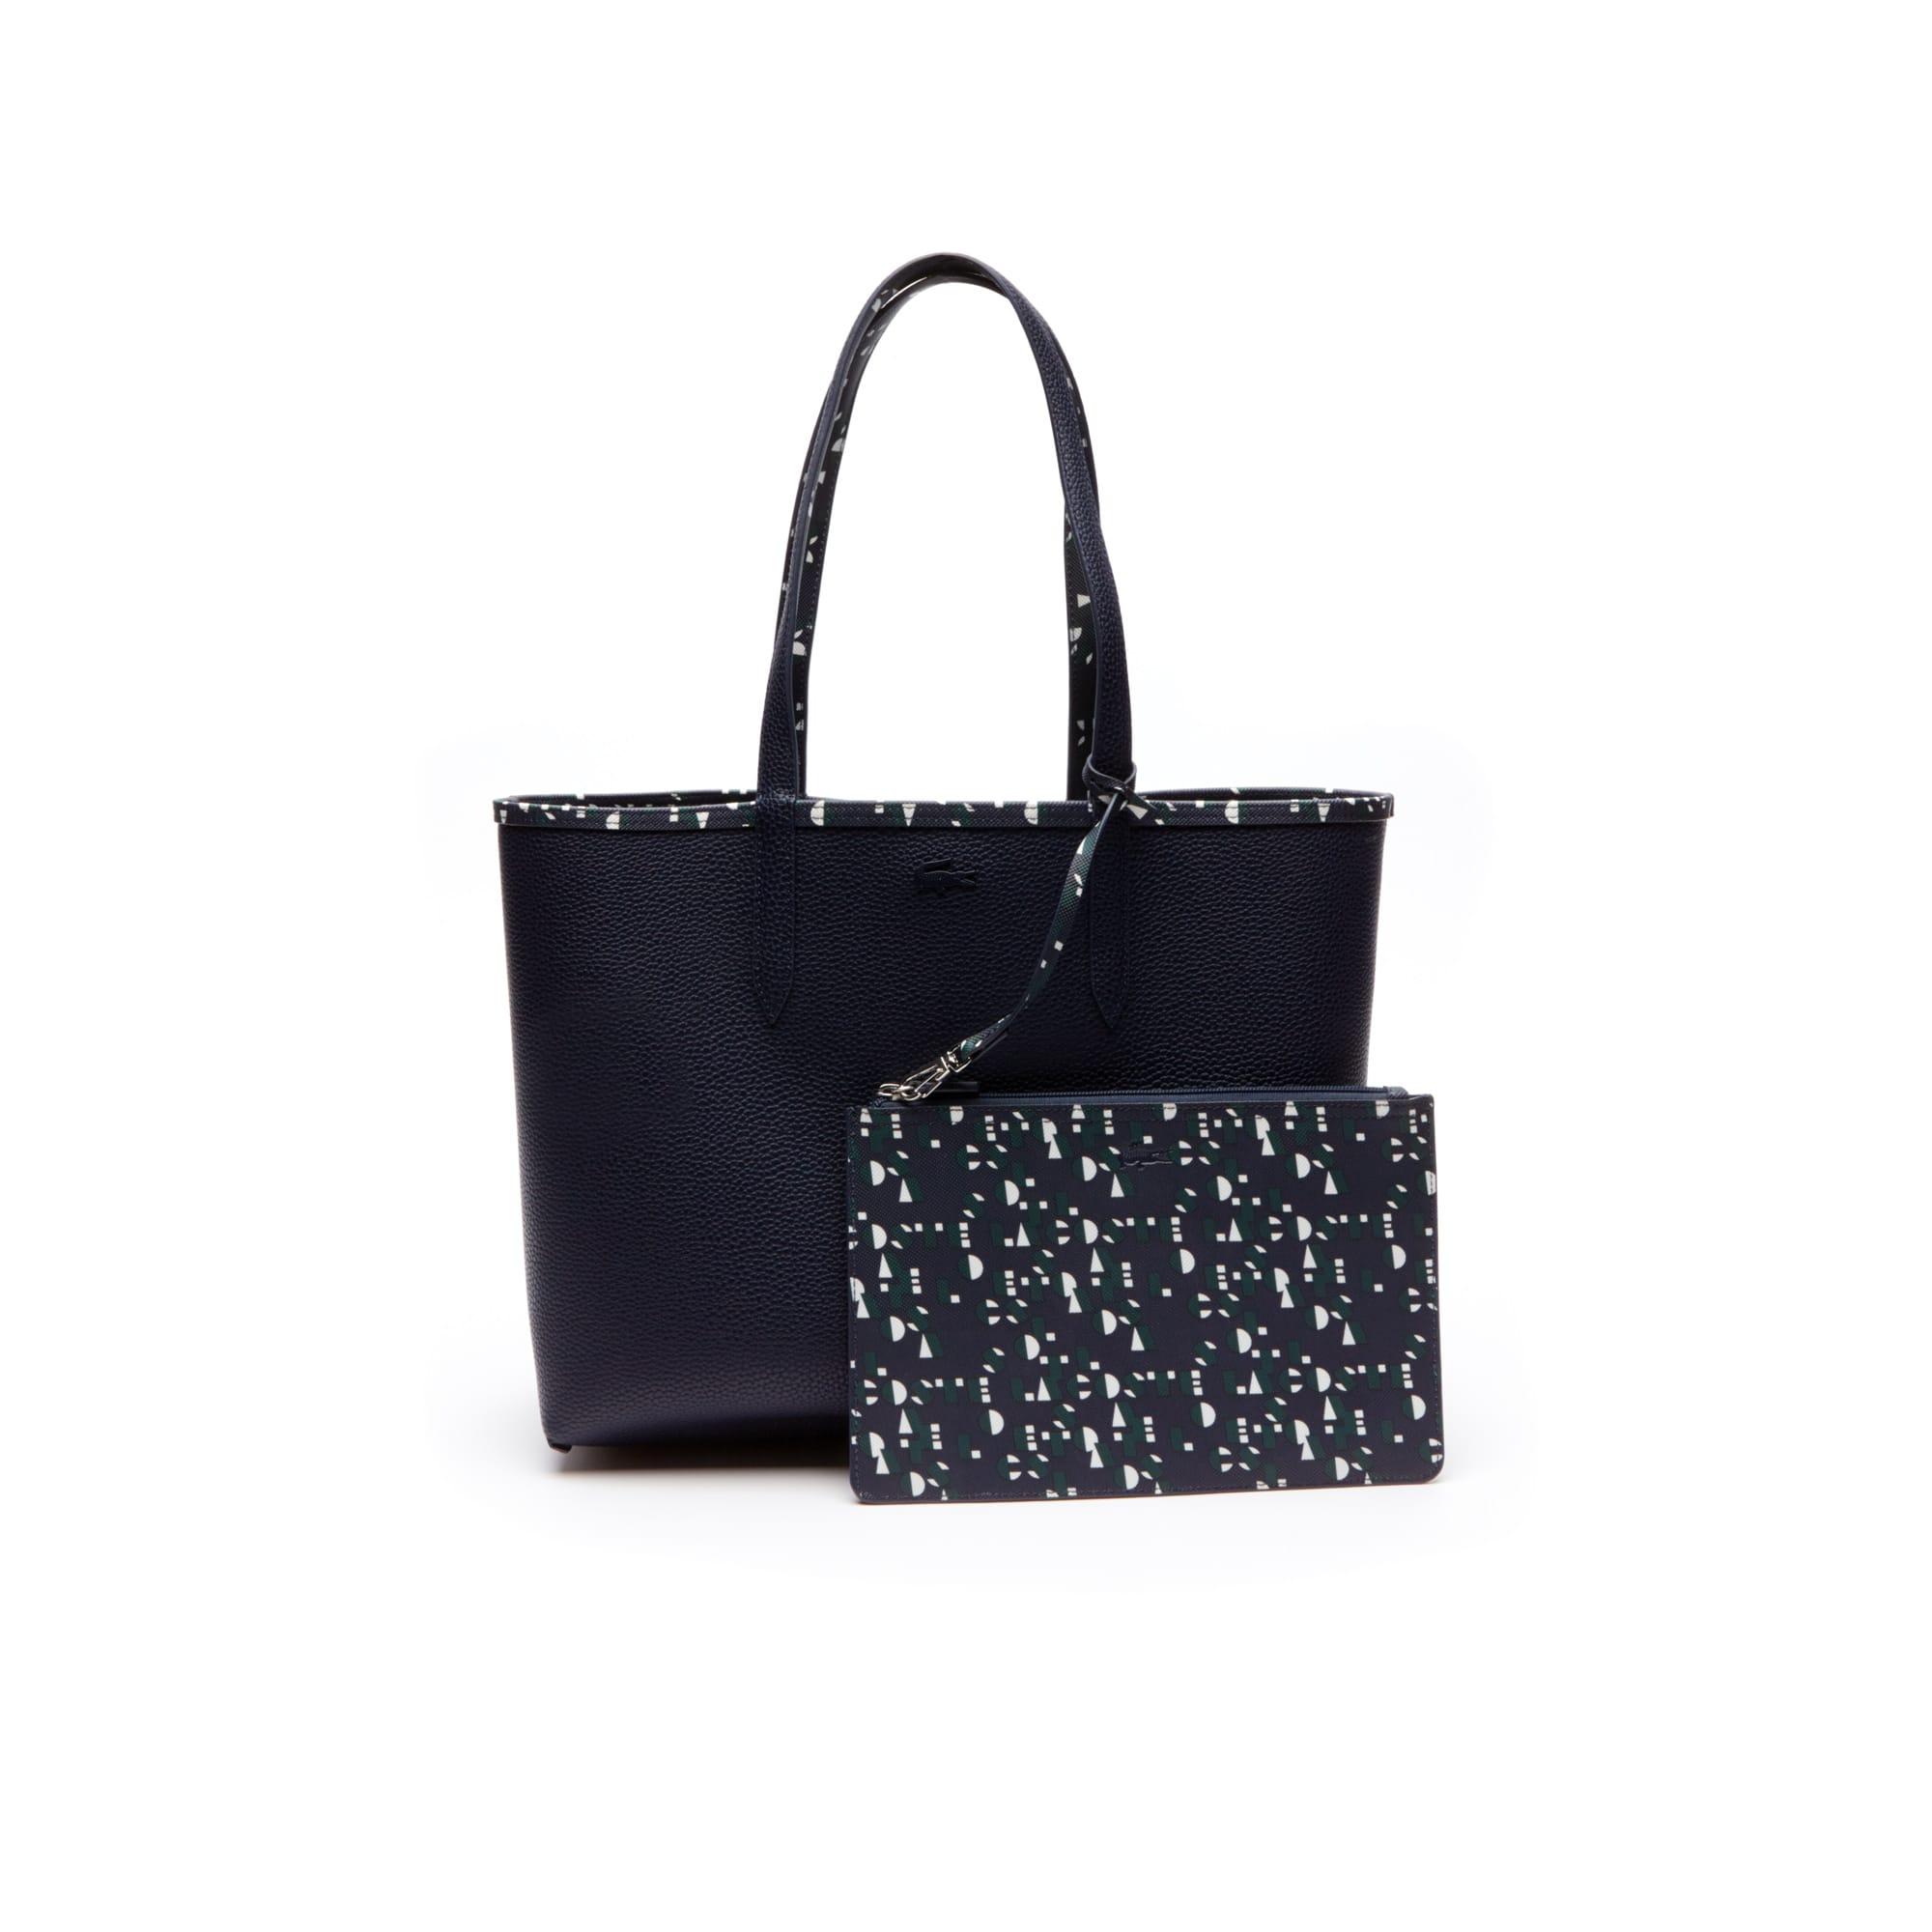 Shopping bag con stampa Lacoste bicolore double face Anna da donna